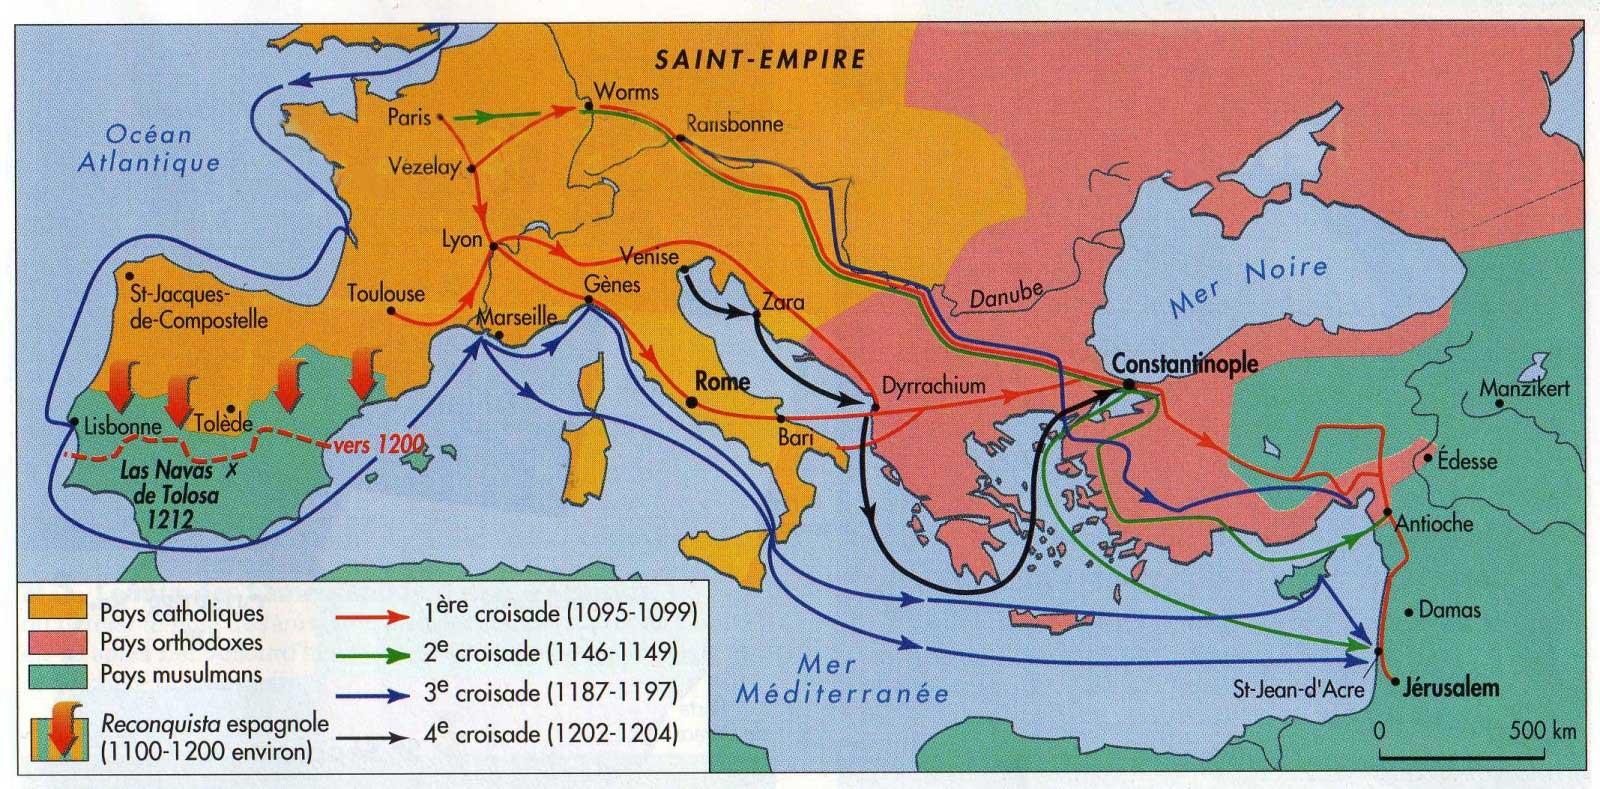 grandes civilisations mediterraneennes